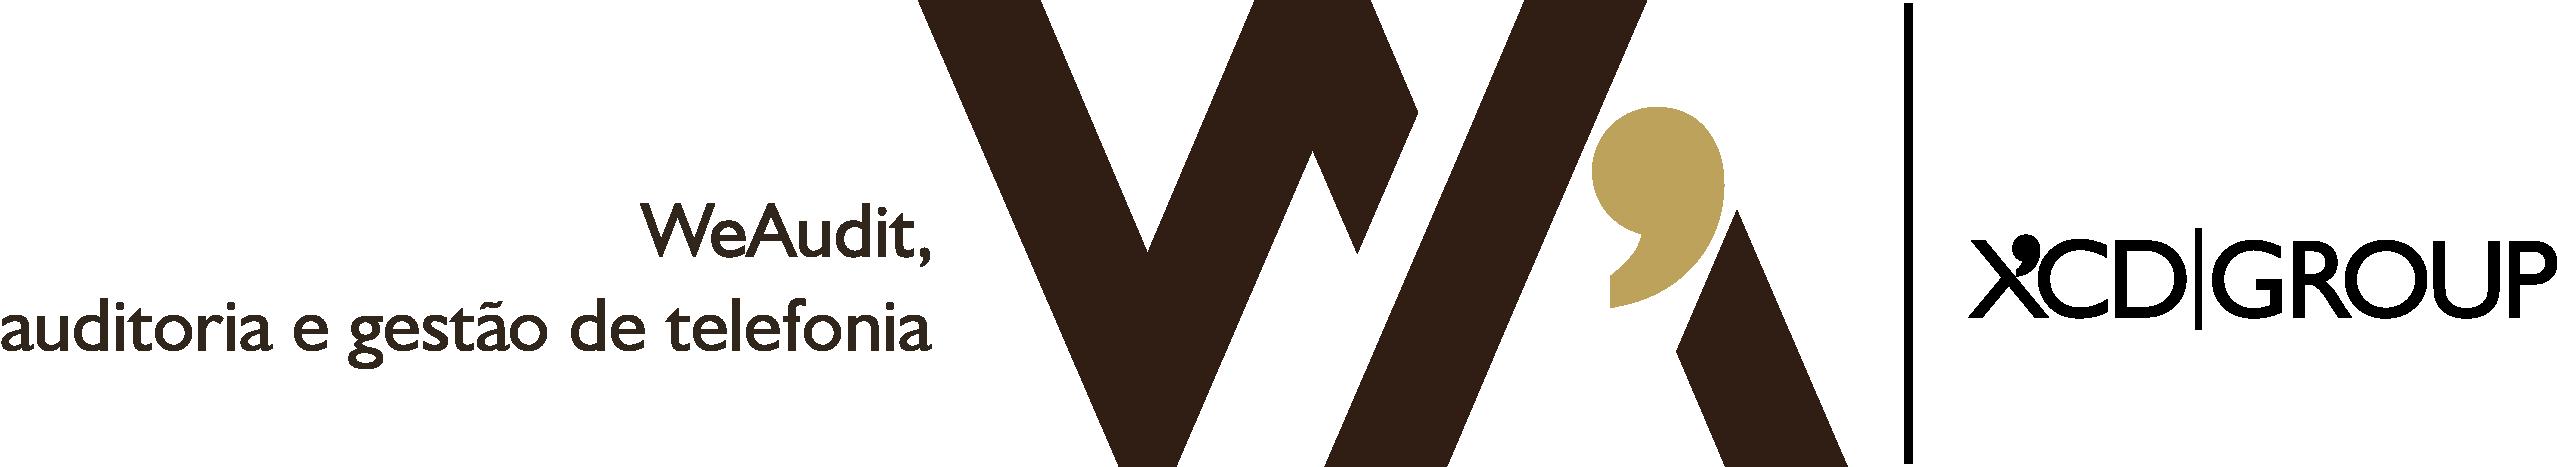 Auditoria em telefonia | WeAudit